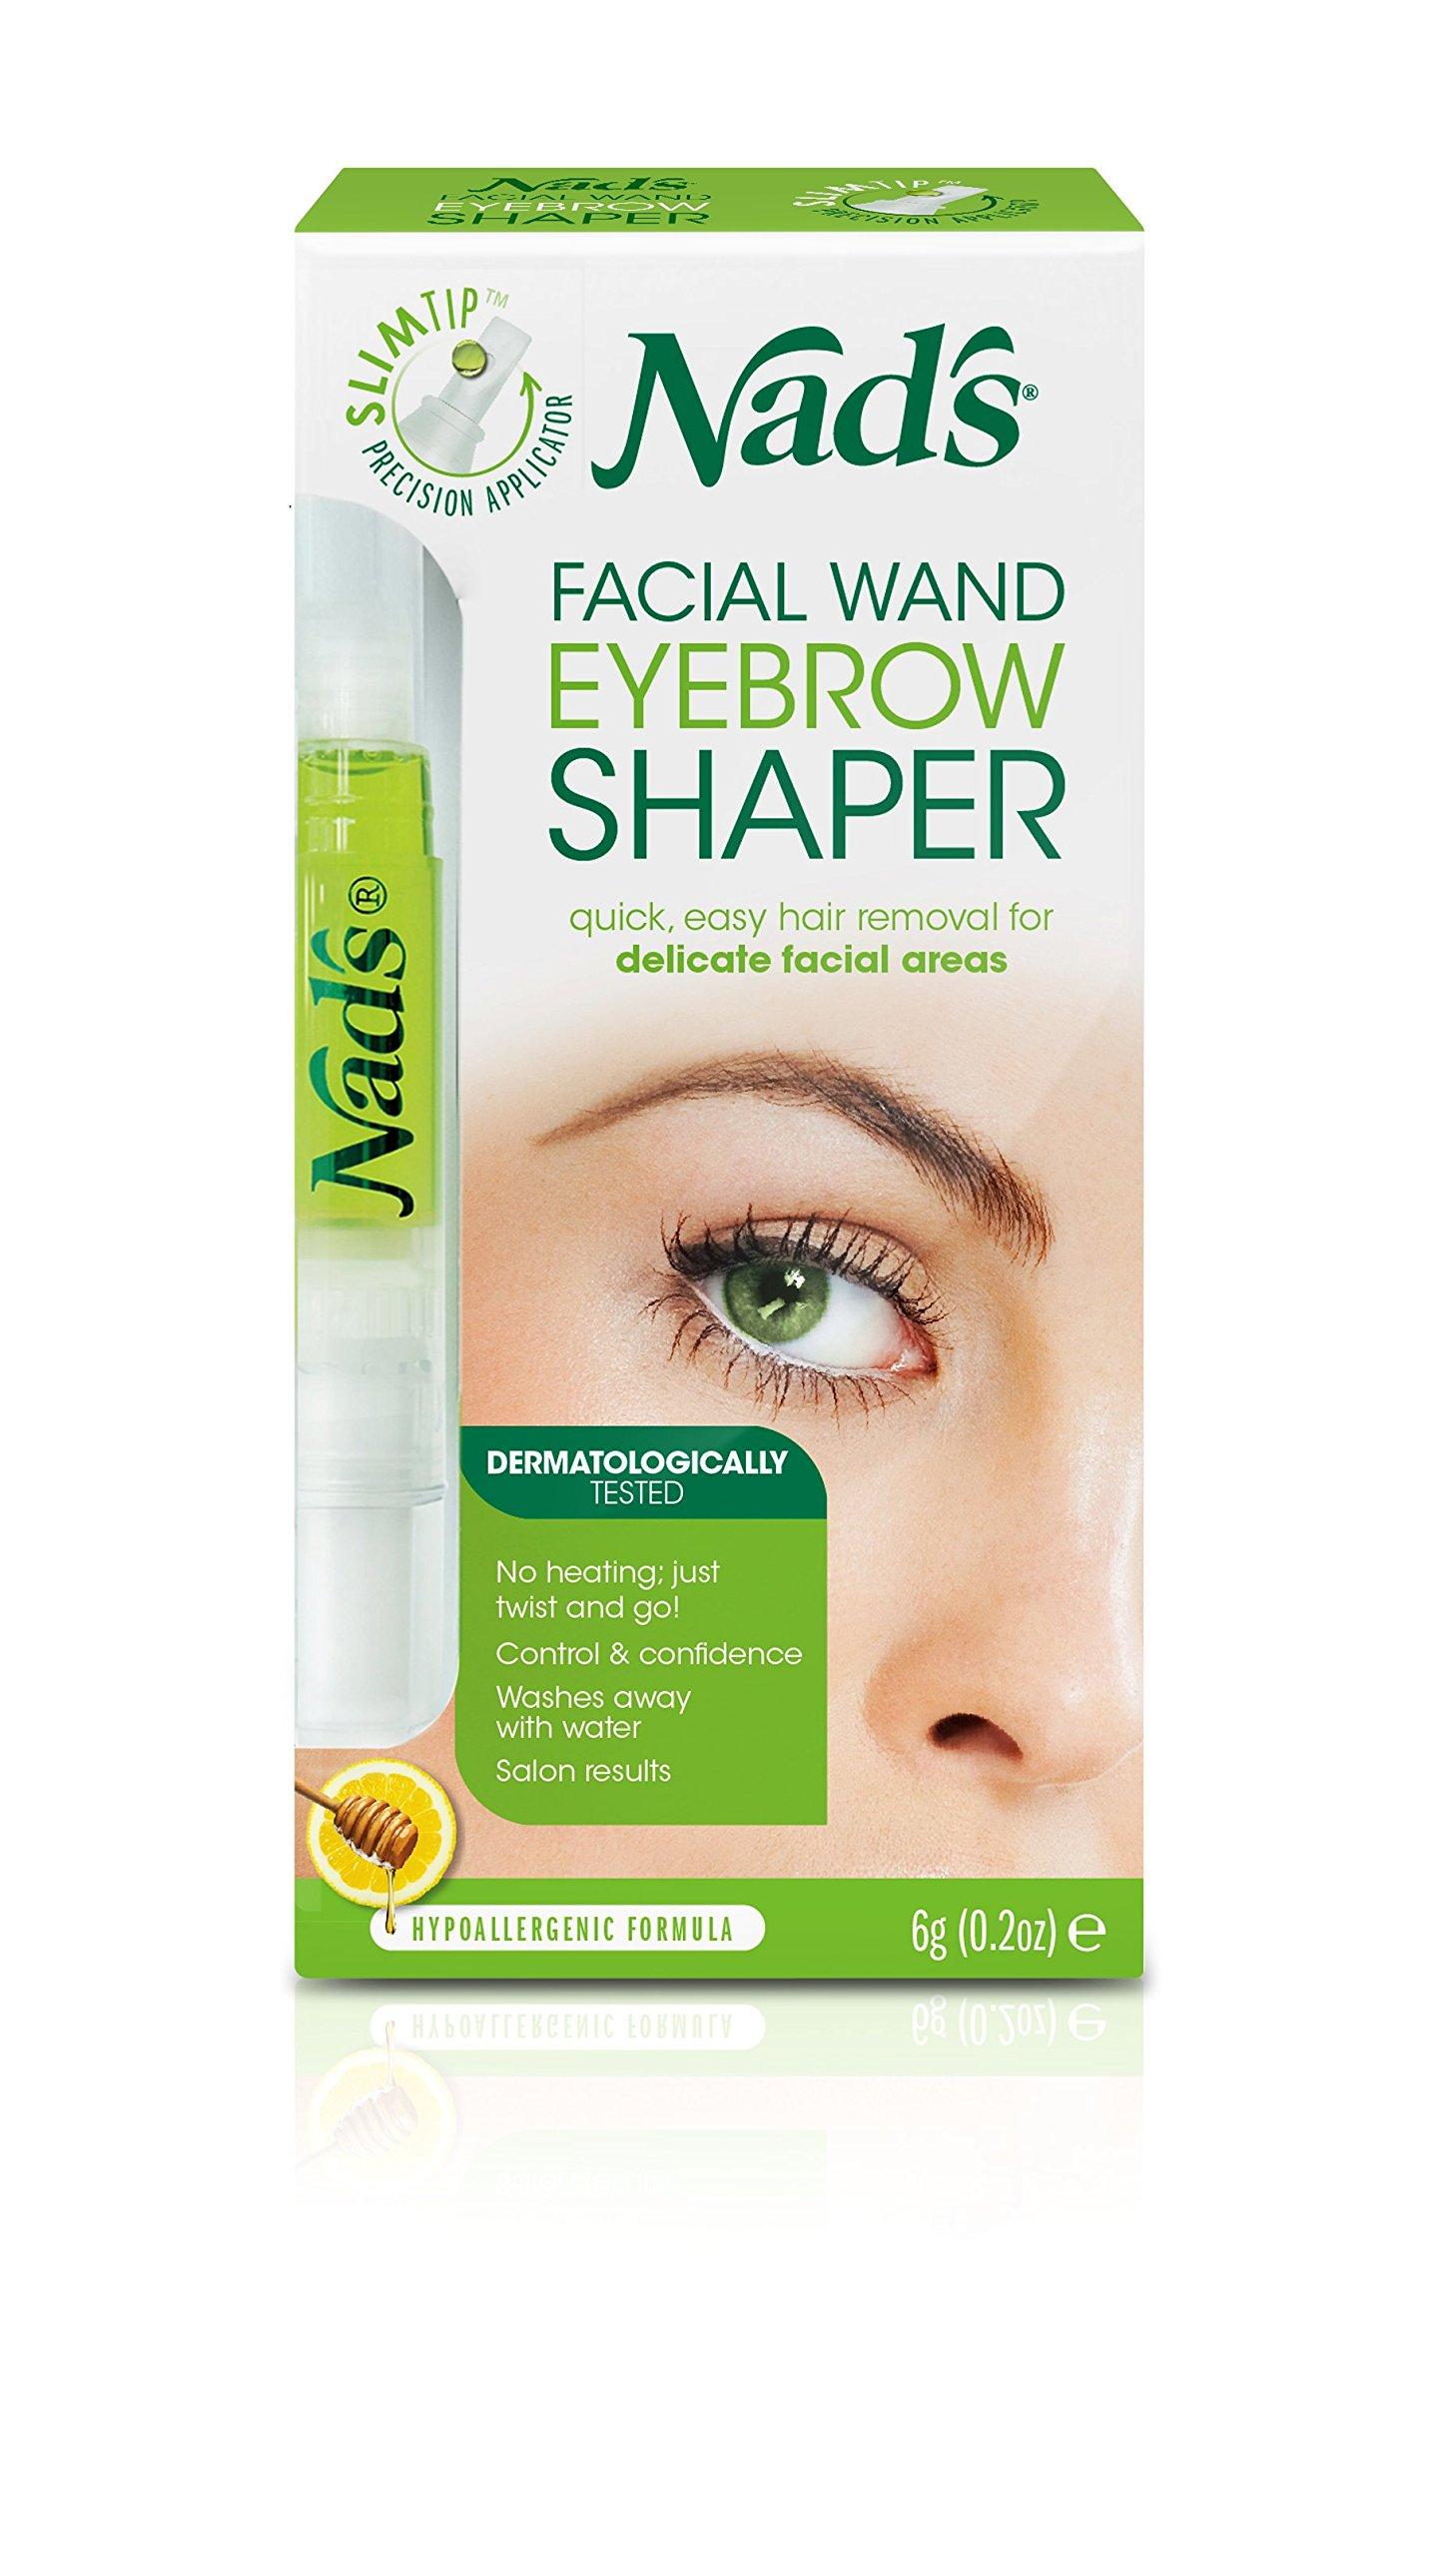 Nads Facial Wand Eyebrow Shaper 6g